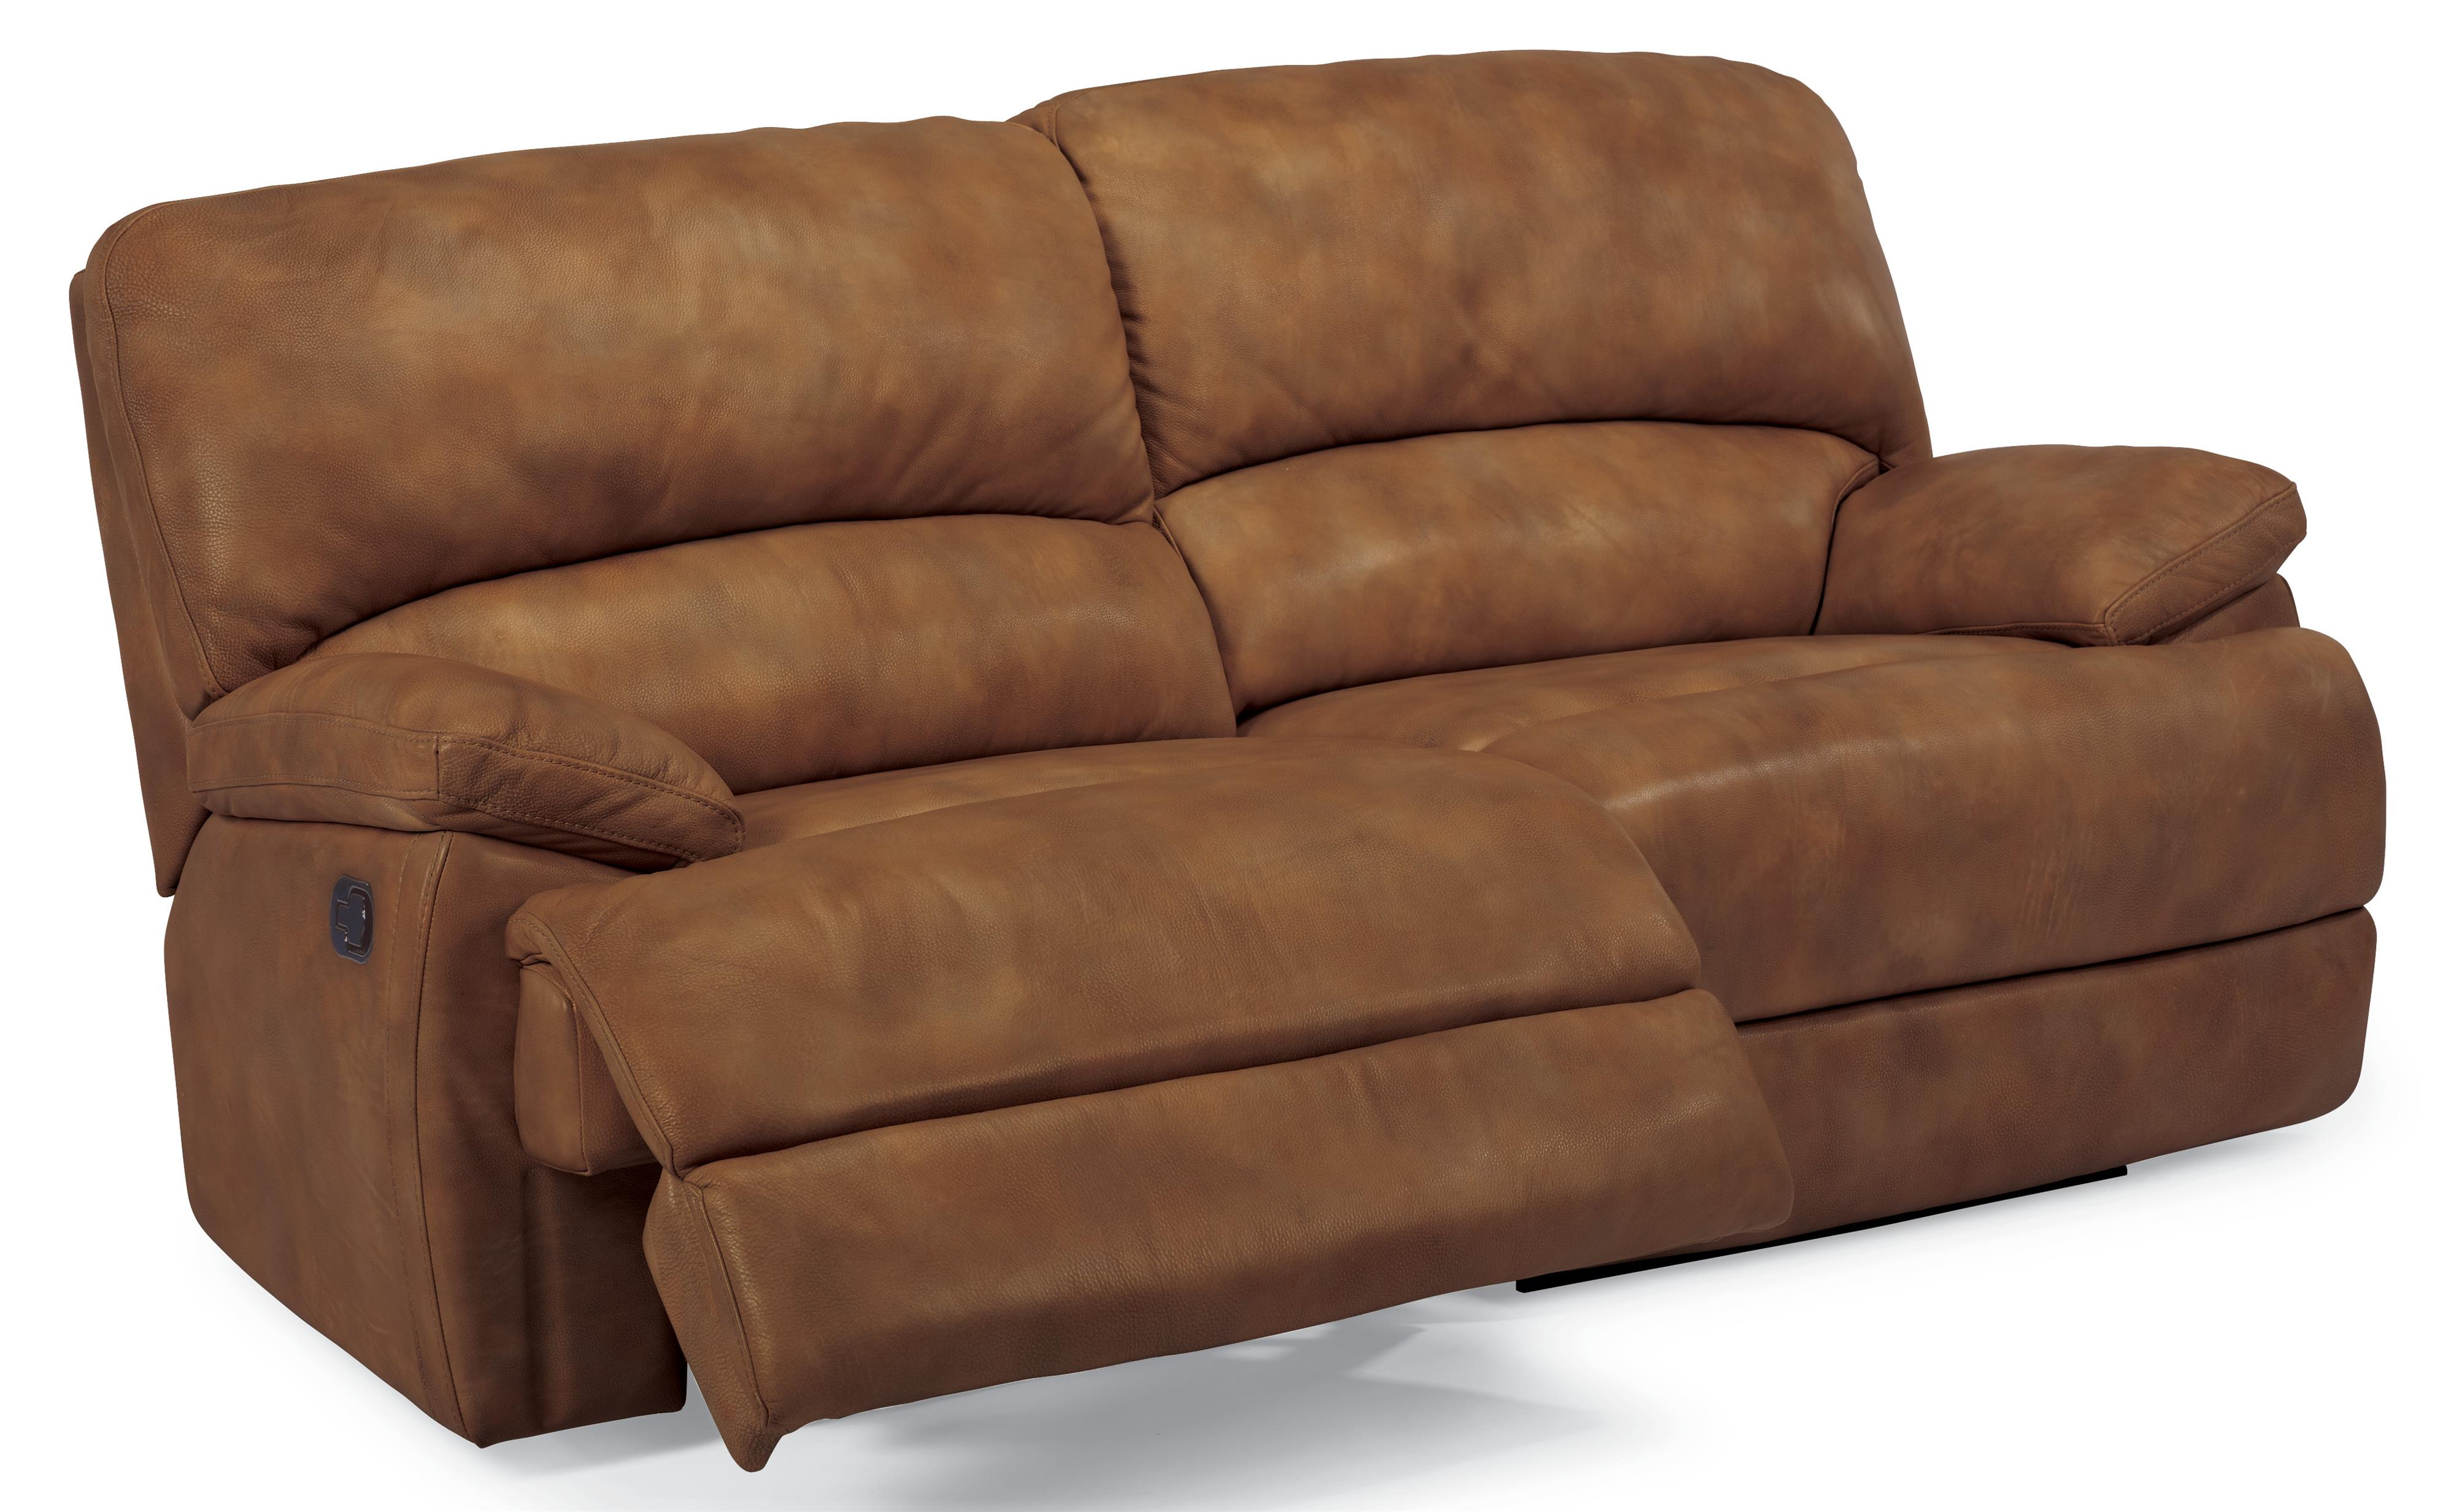 Flexsteel Latitudes - Dylan Double Reclining Sofa - Item Number: 1127-620-908-80